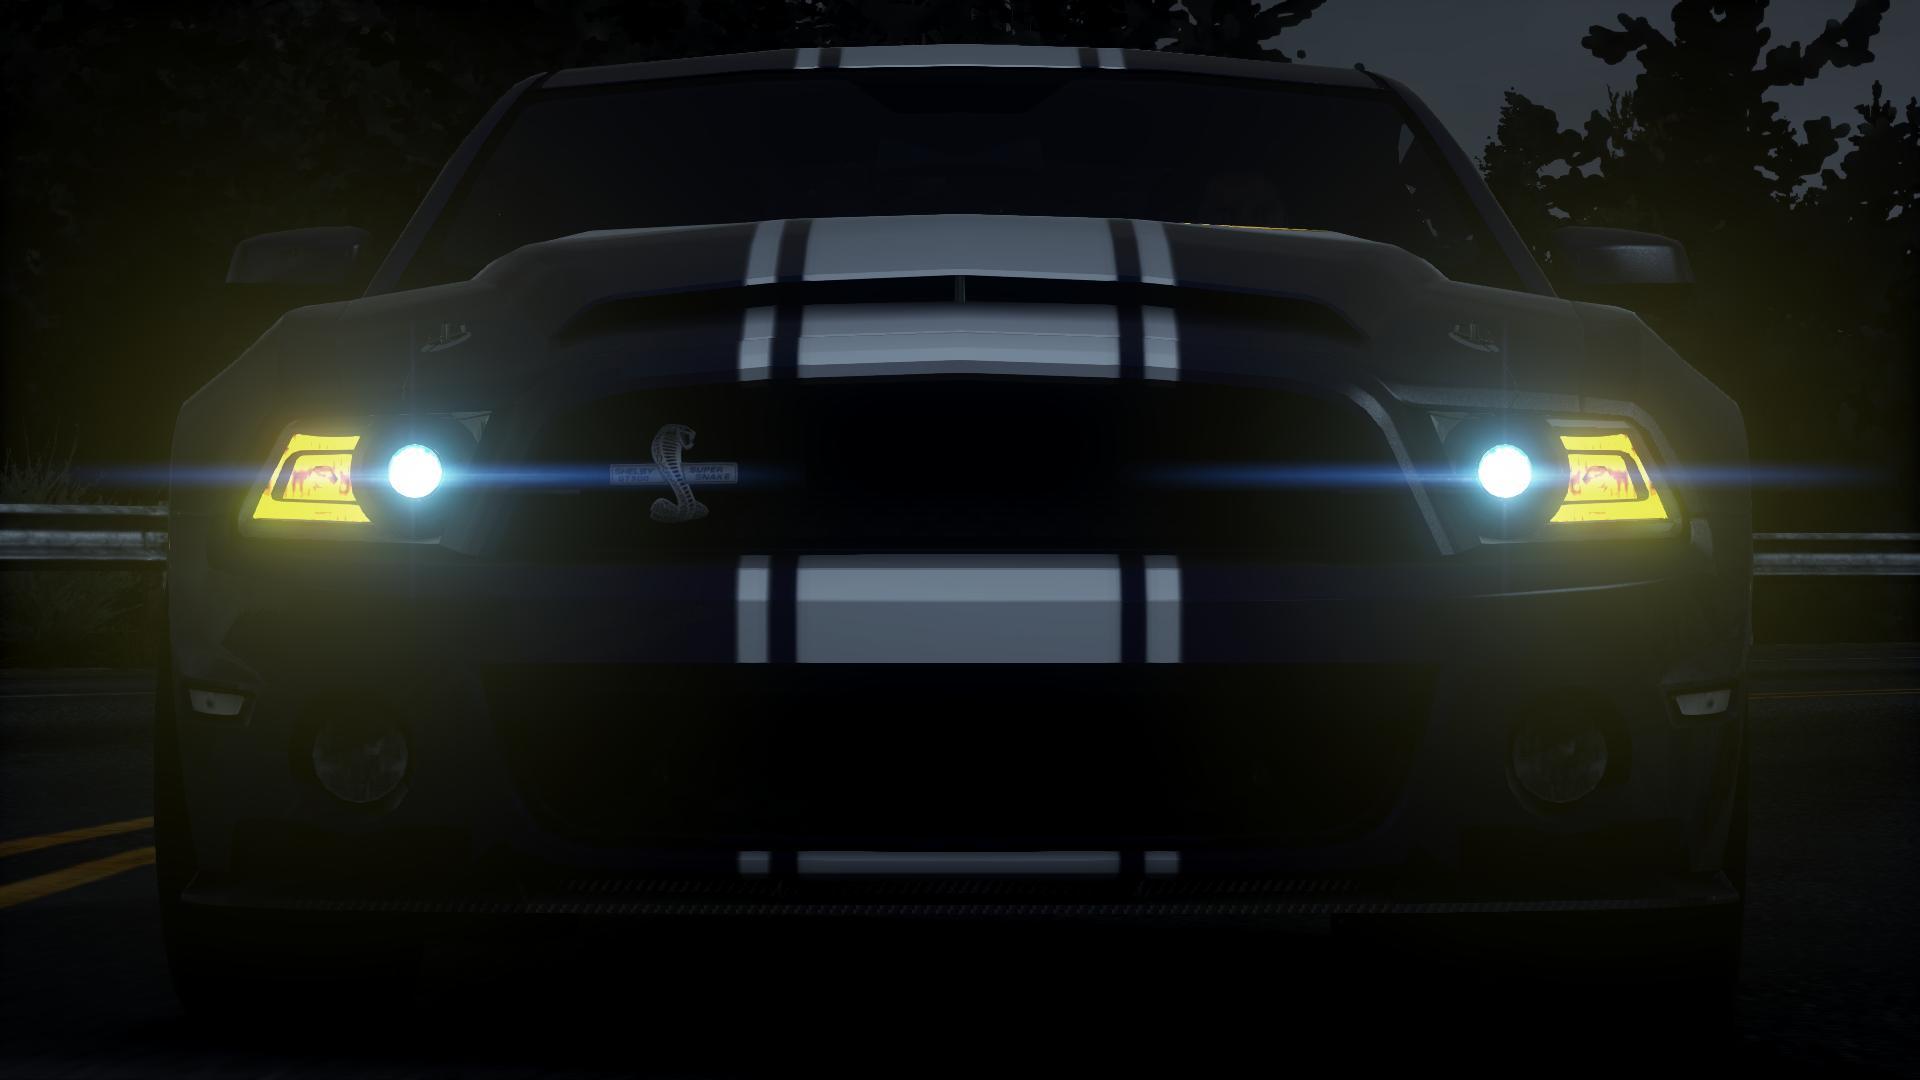 Lights Need For Speed Wiki Fandom Powered By Wikia